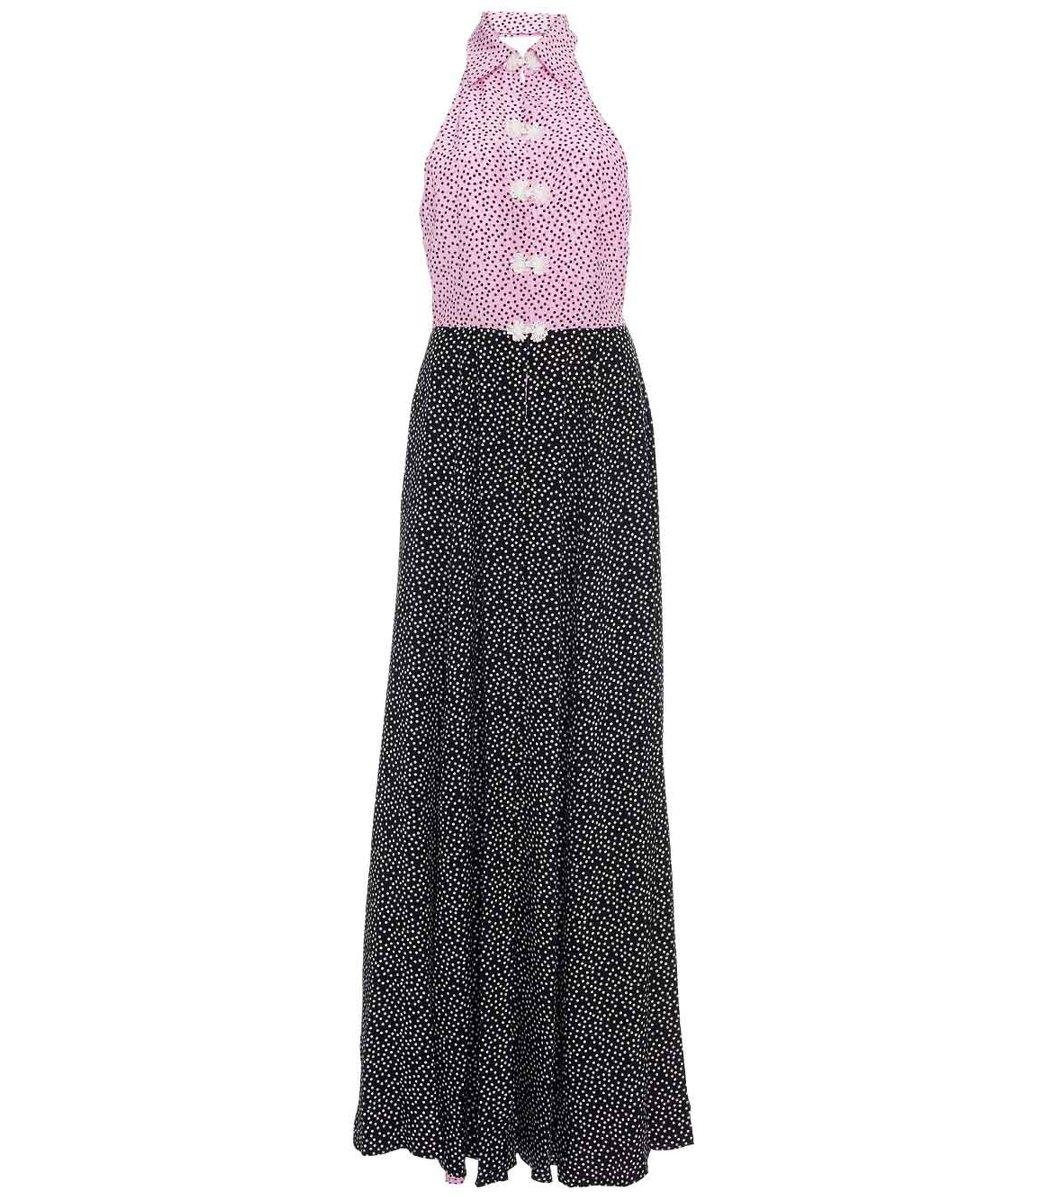 Rebecca De Ravenel Two-Toned Polka Dot Halter Neck Maxi Dress